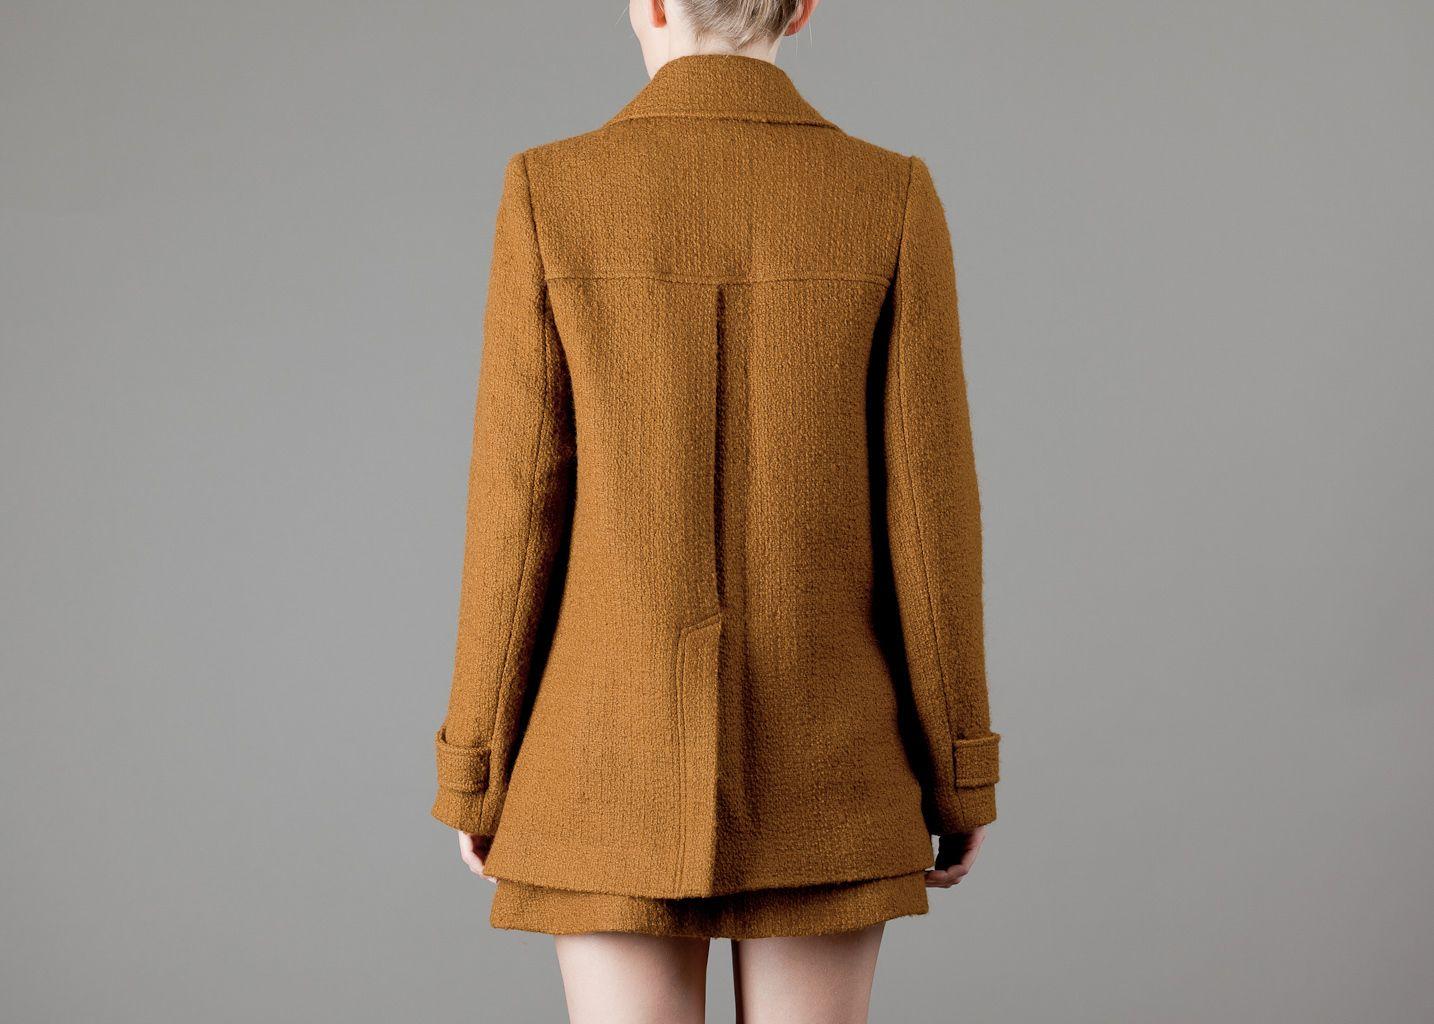 Dursley Coat - Suzie Winkle